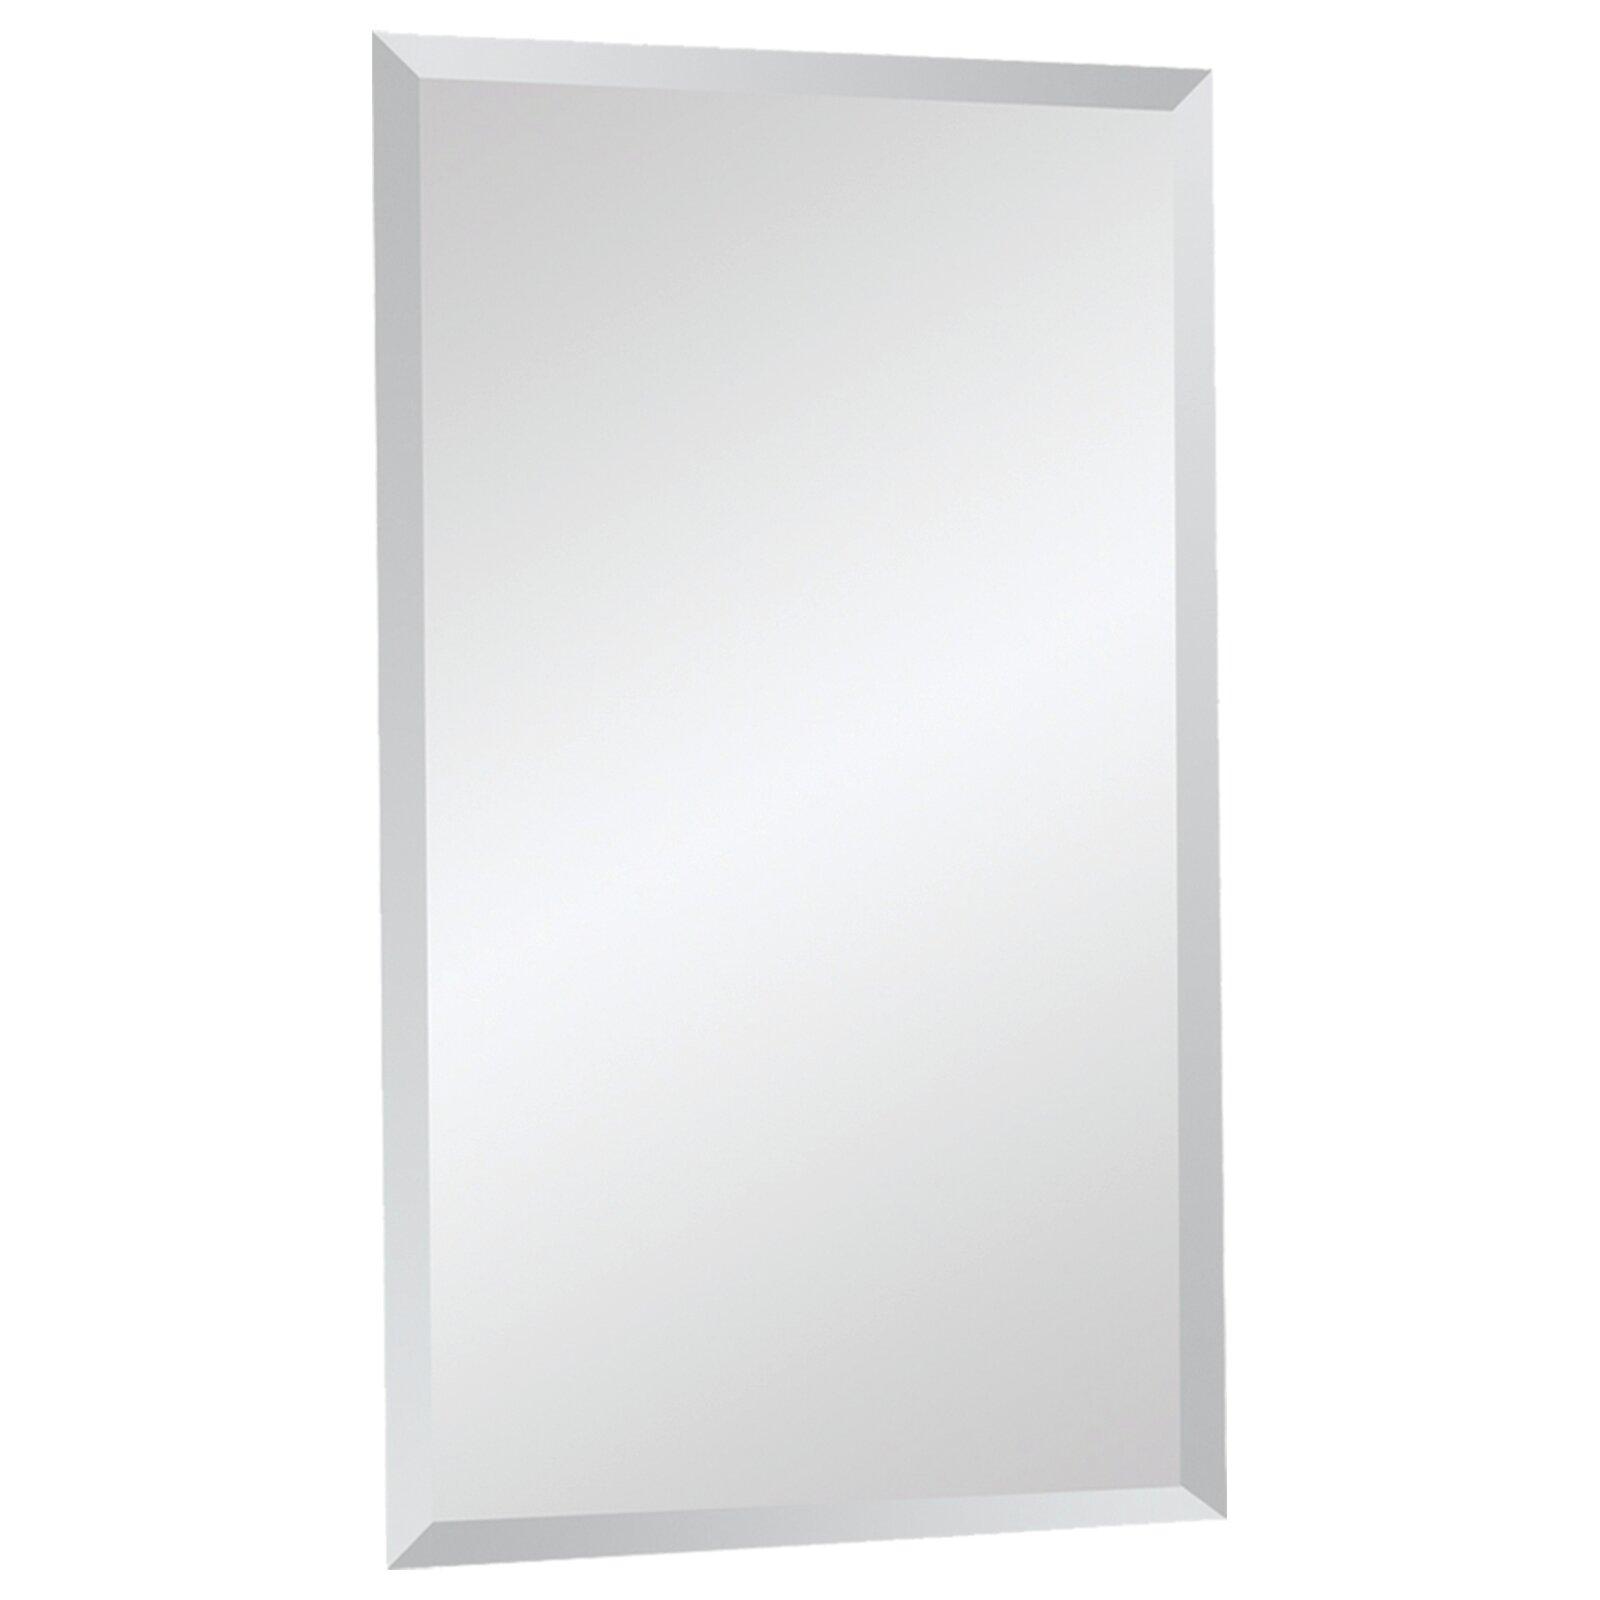 Beveled Bathroom Mirror #33: Ren-Wil Frameless Beveled Rectangular Wall Mirror